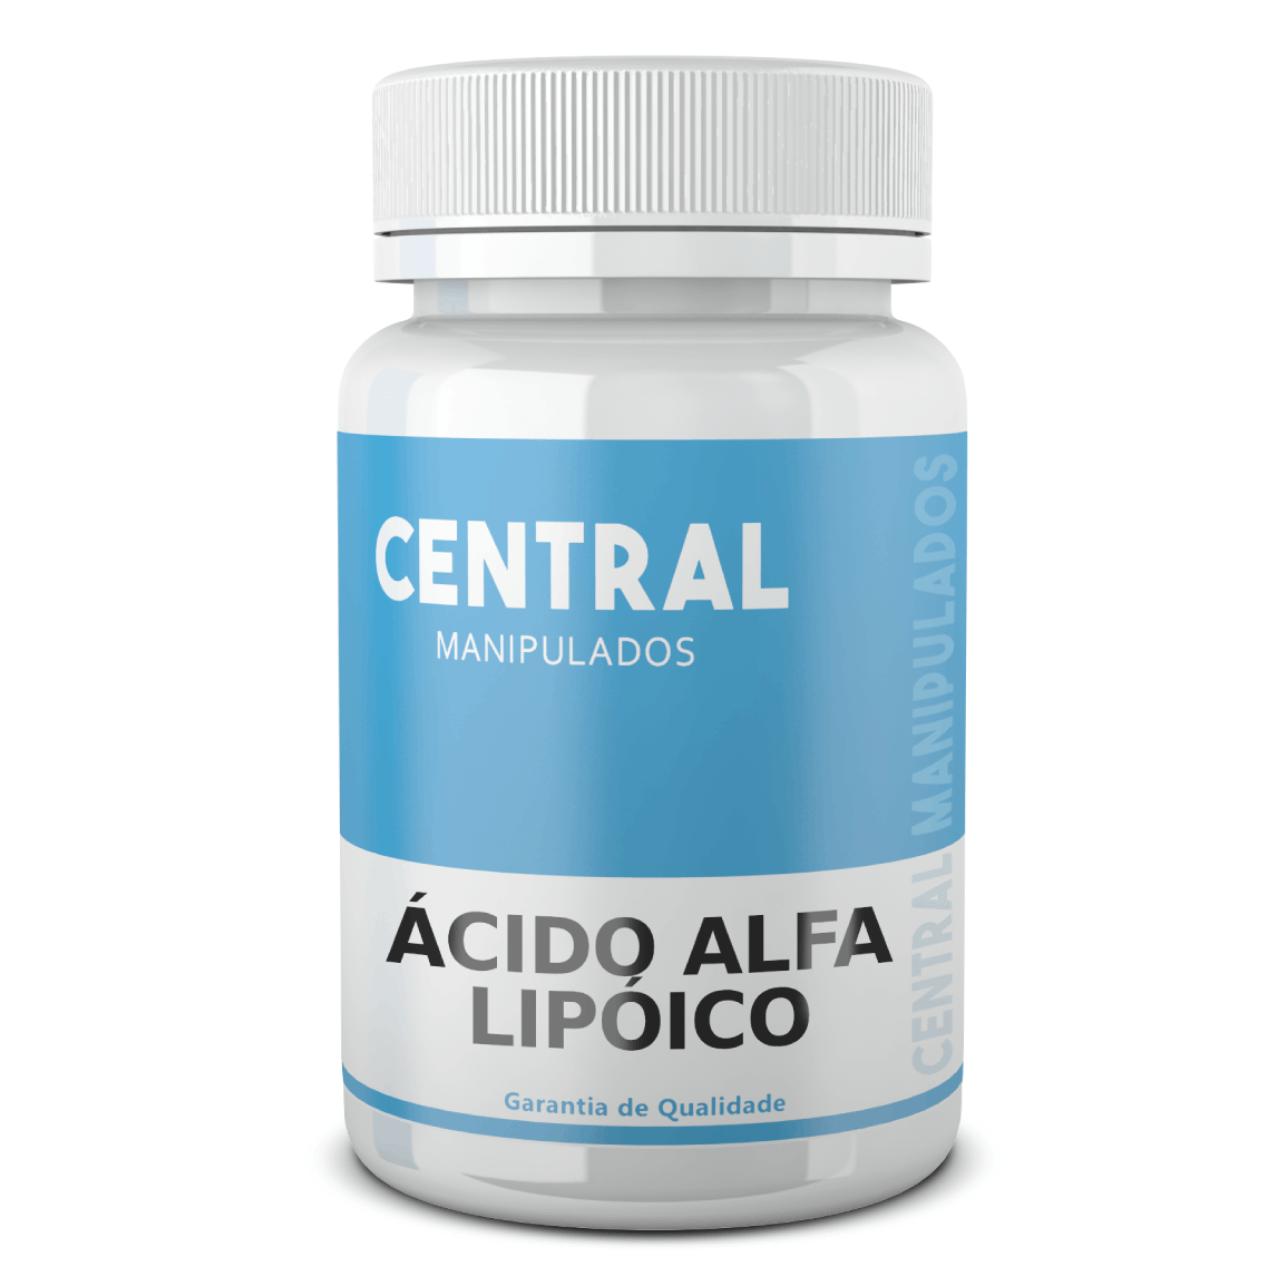 Ácido Alfa Lipóico 500mg - 60 cápsulas - Antioxidante, Auxílio na Proteção Hepática